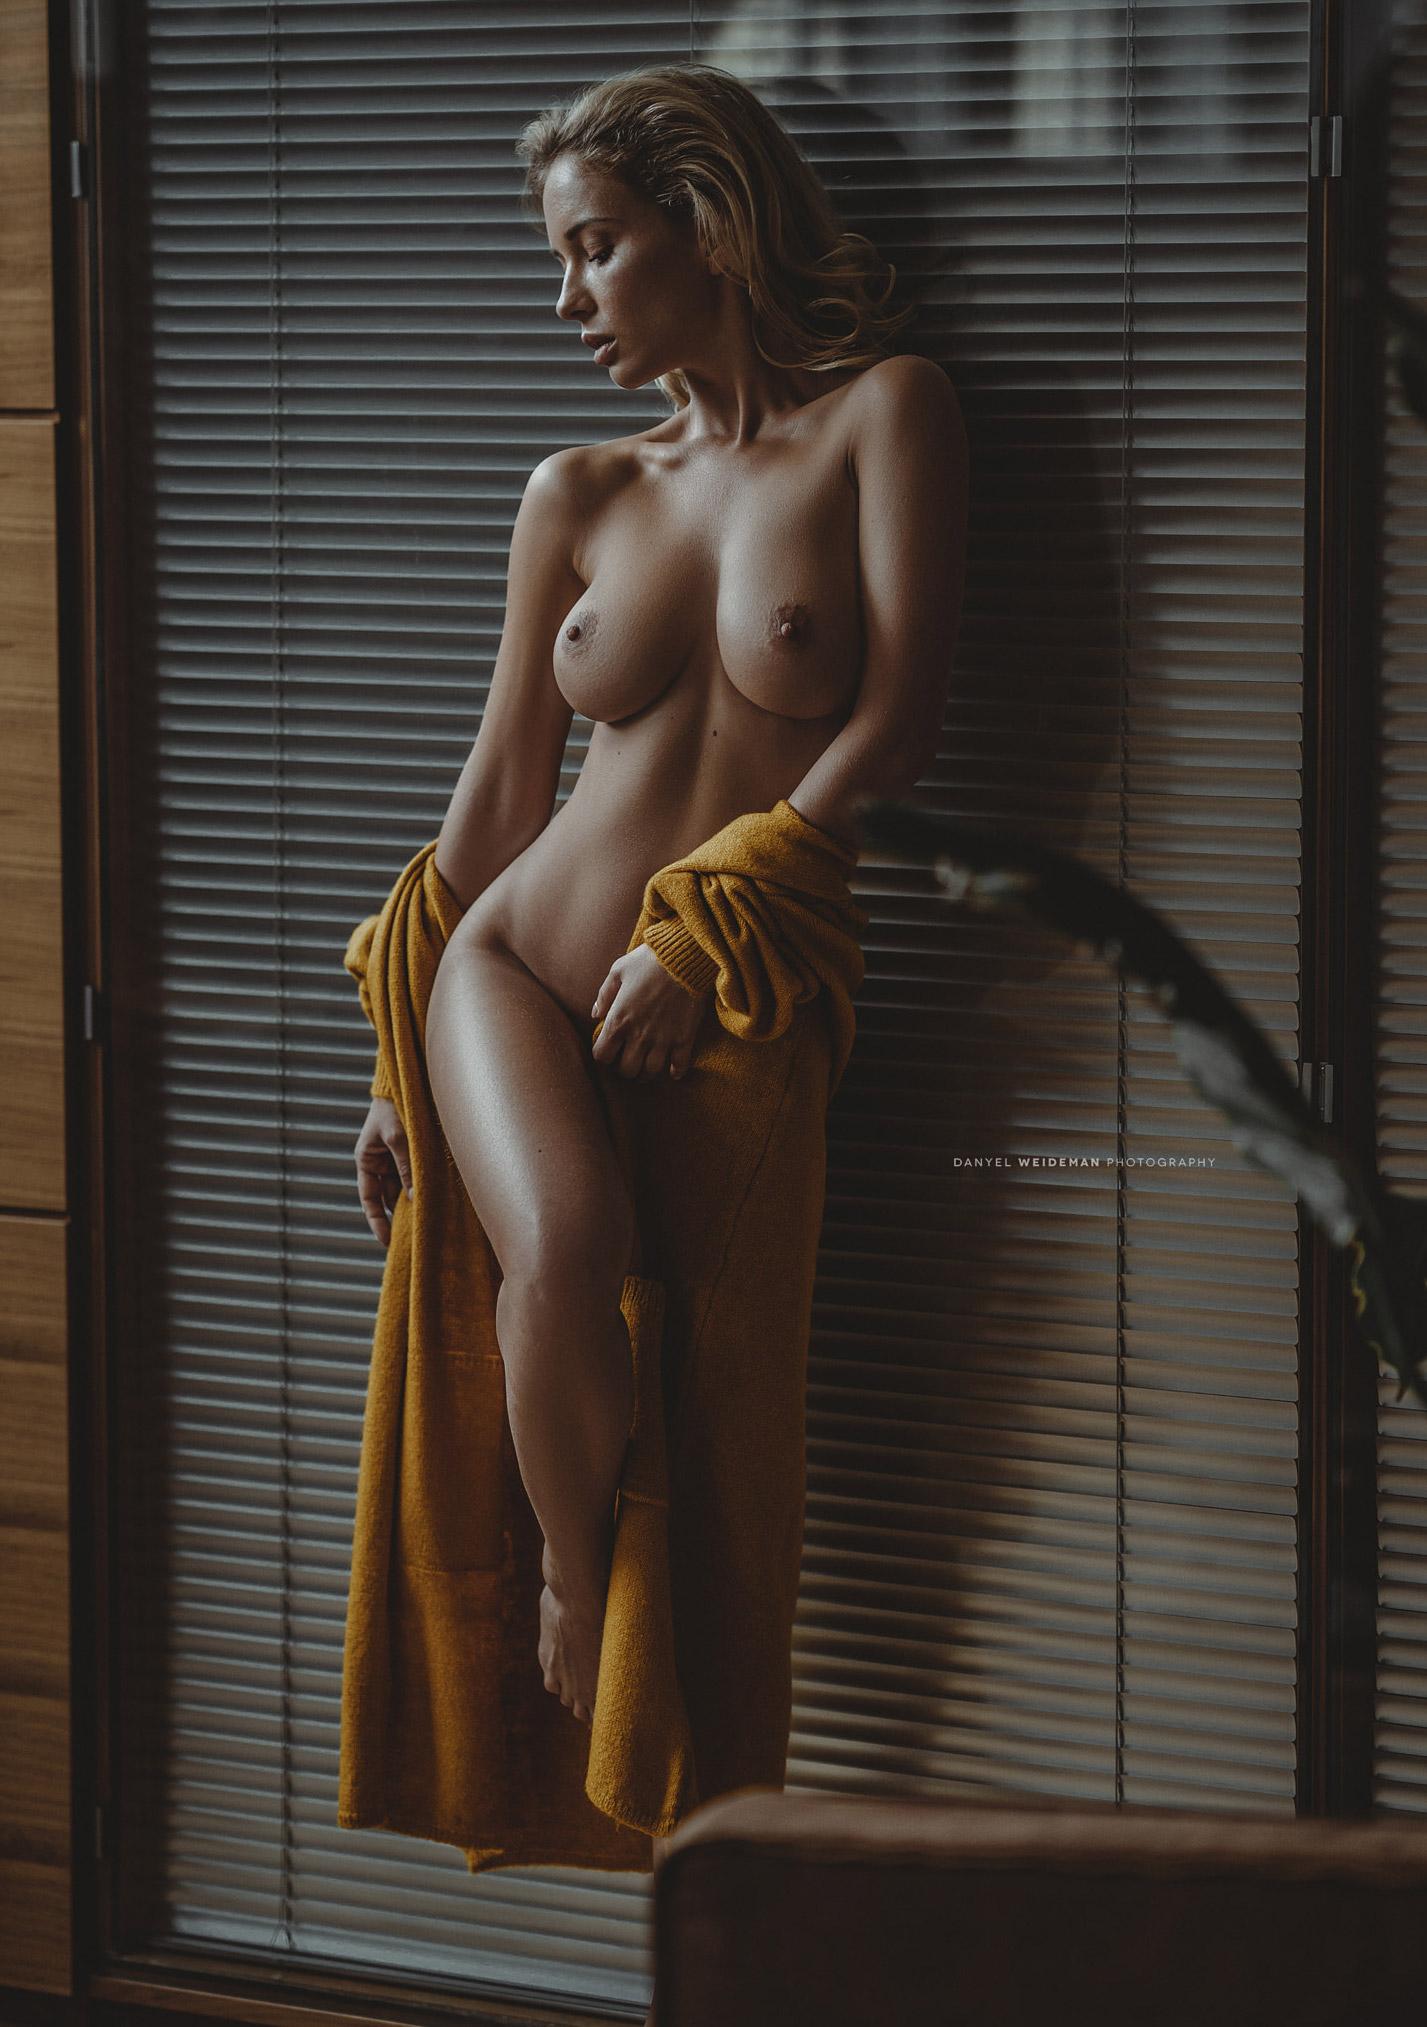 Goddess / Natali Andreeva nude by Danyel Weideman